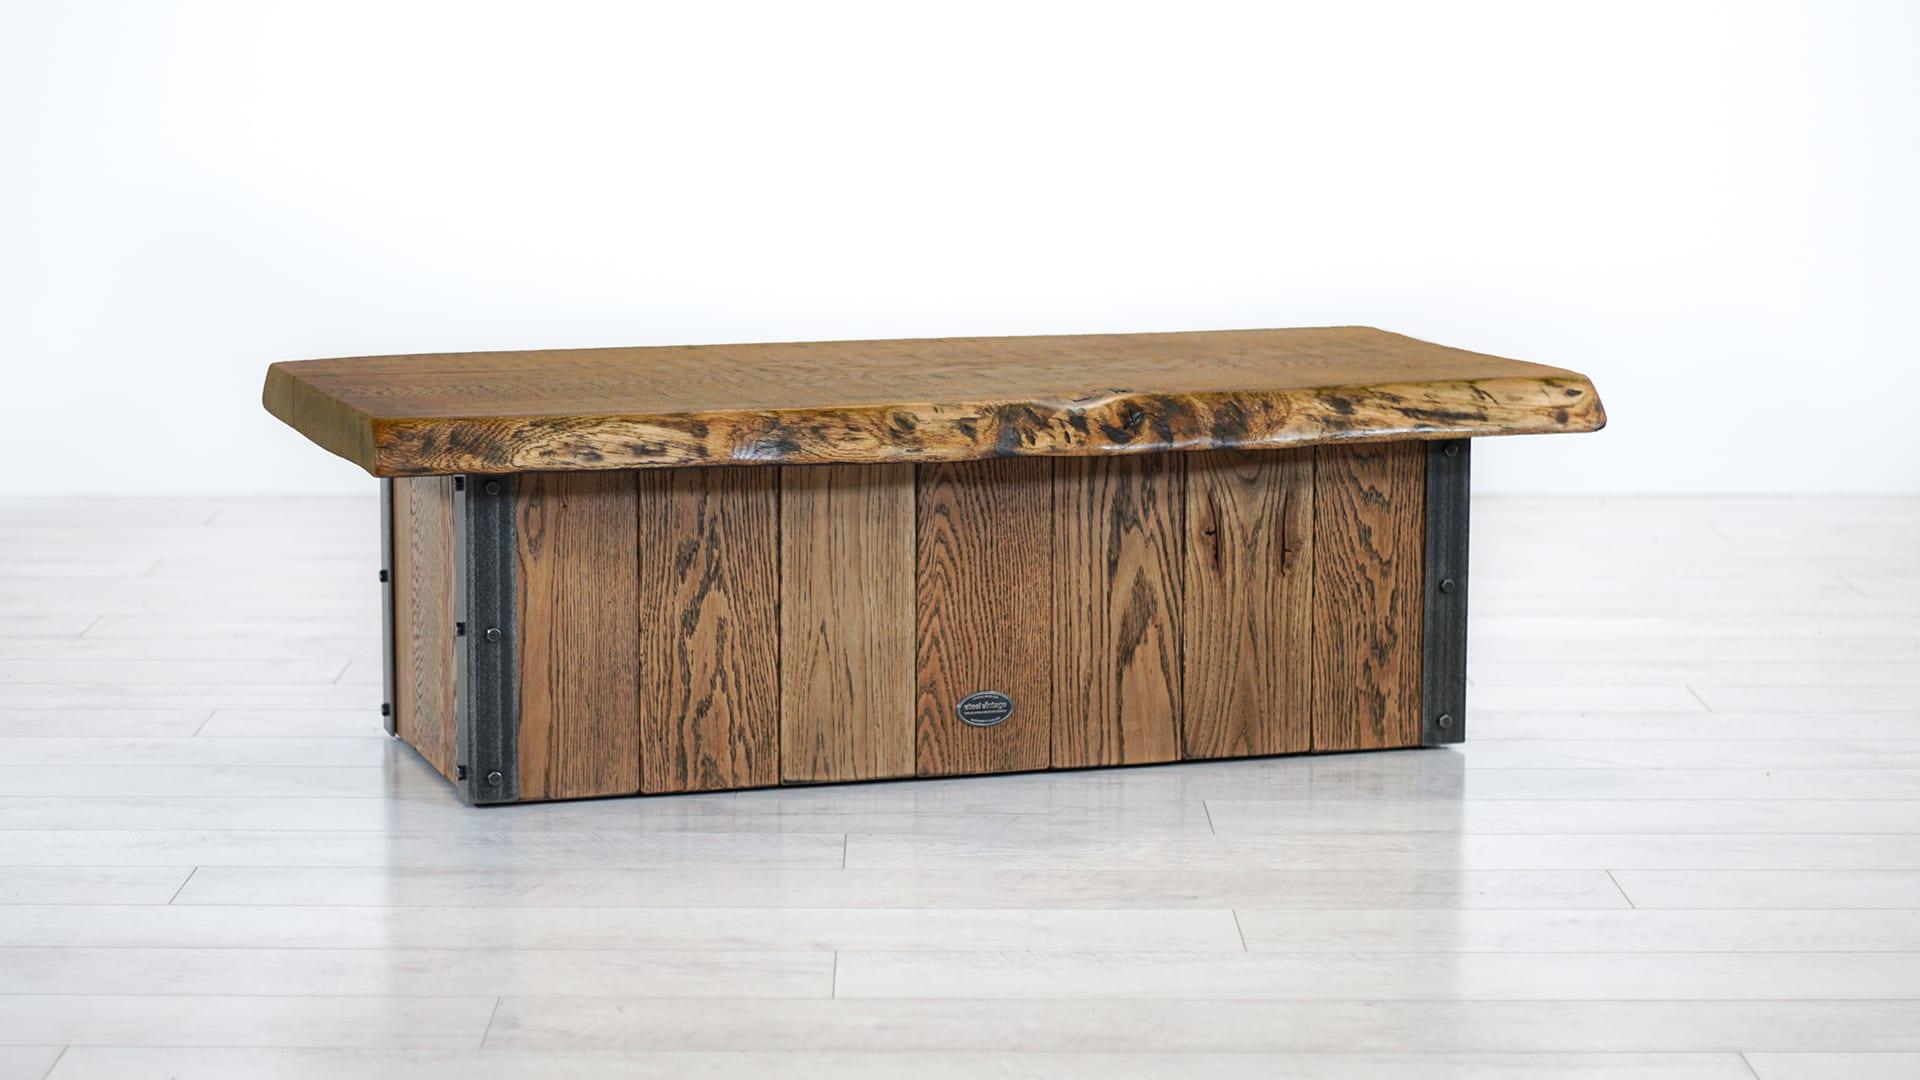 Steel Vintage Grand Oak Coffee Table